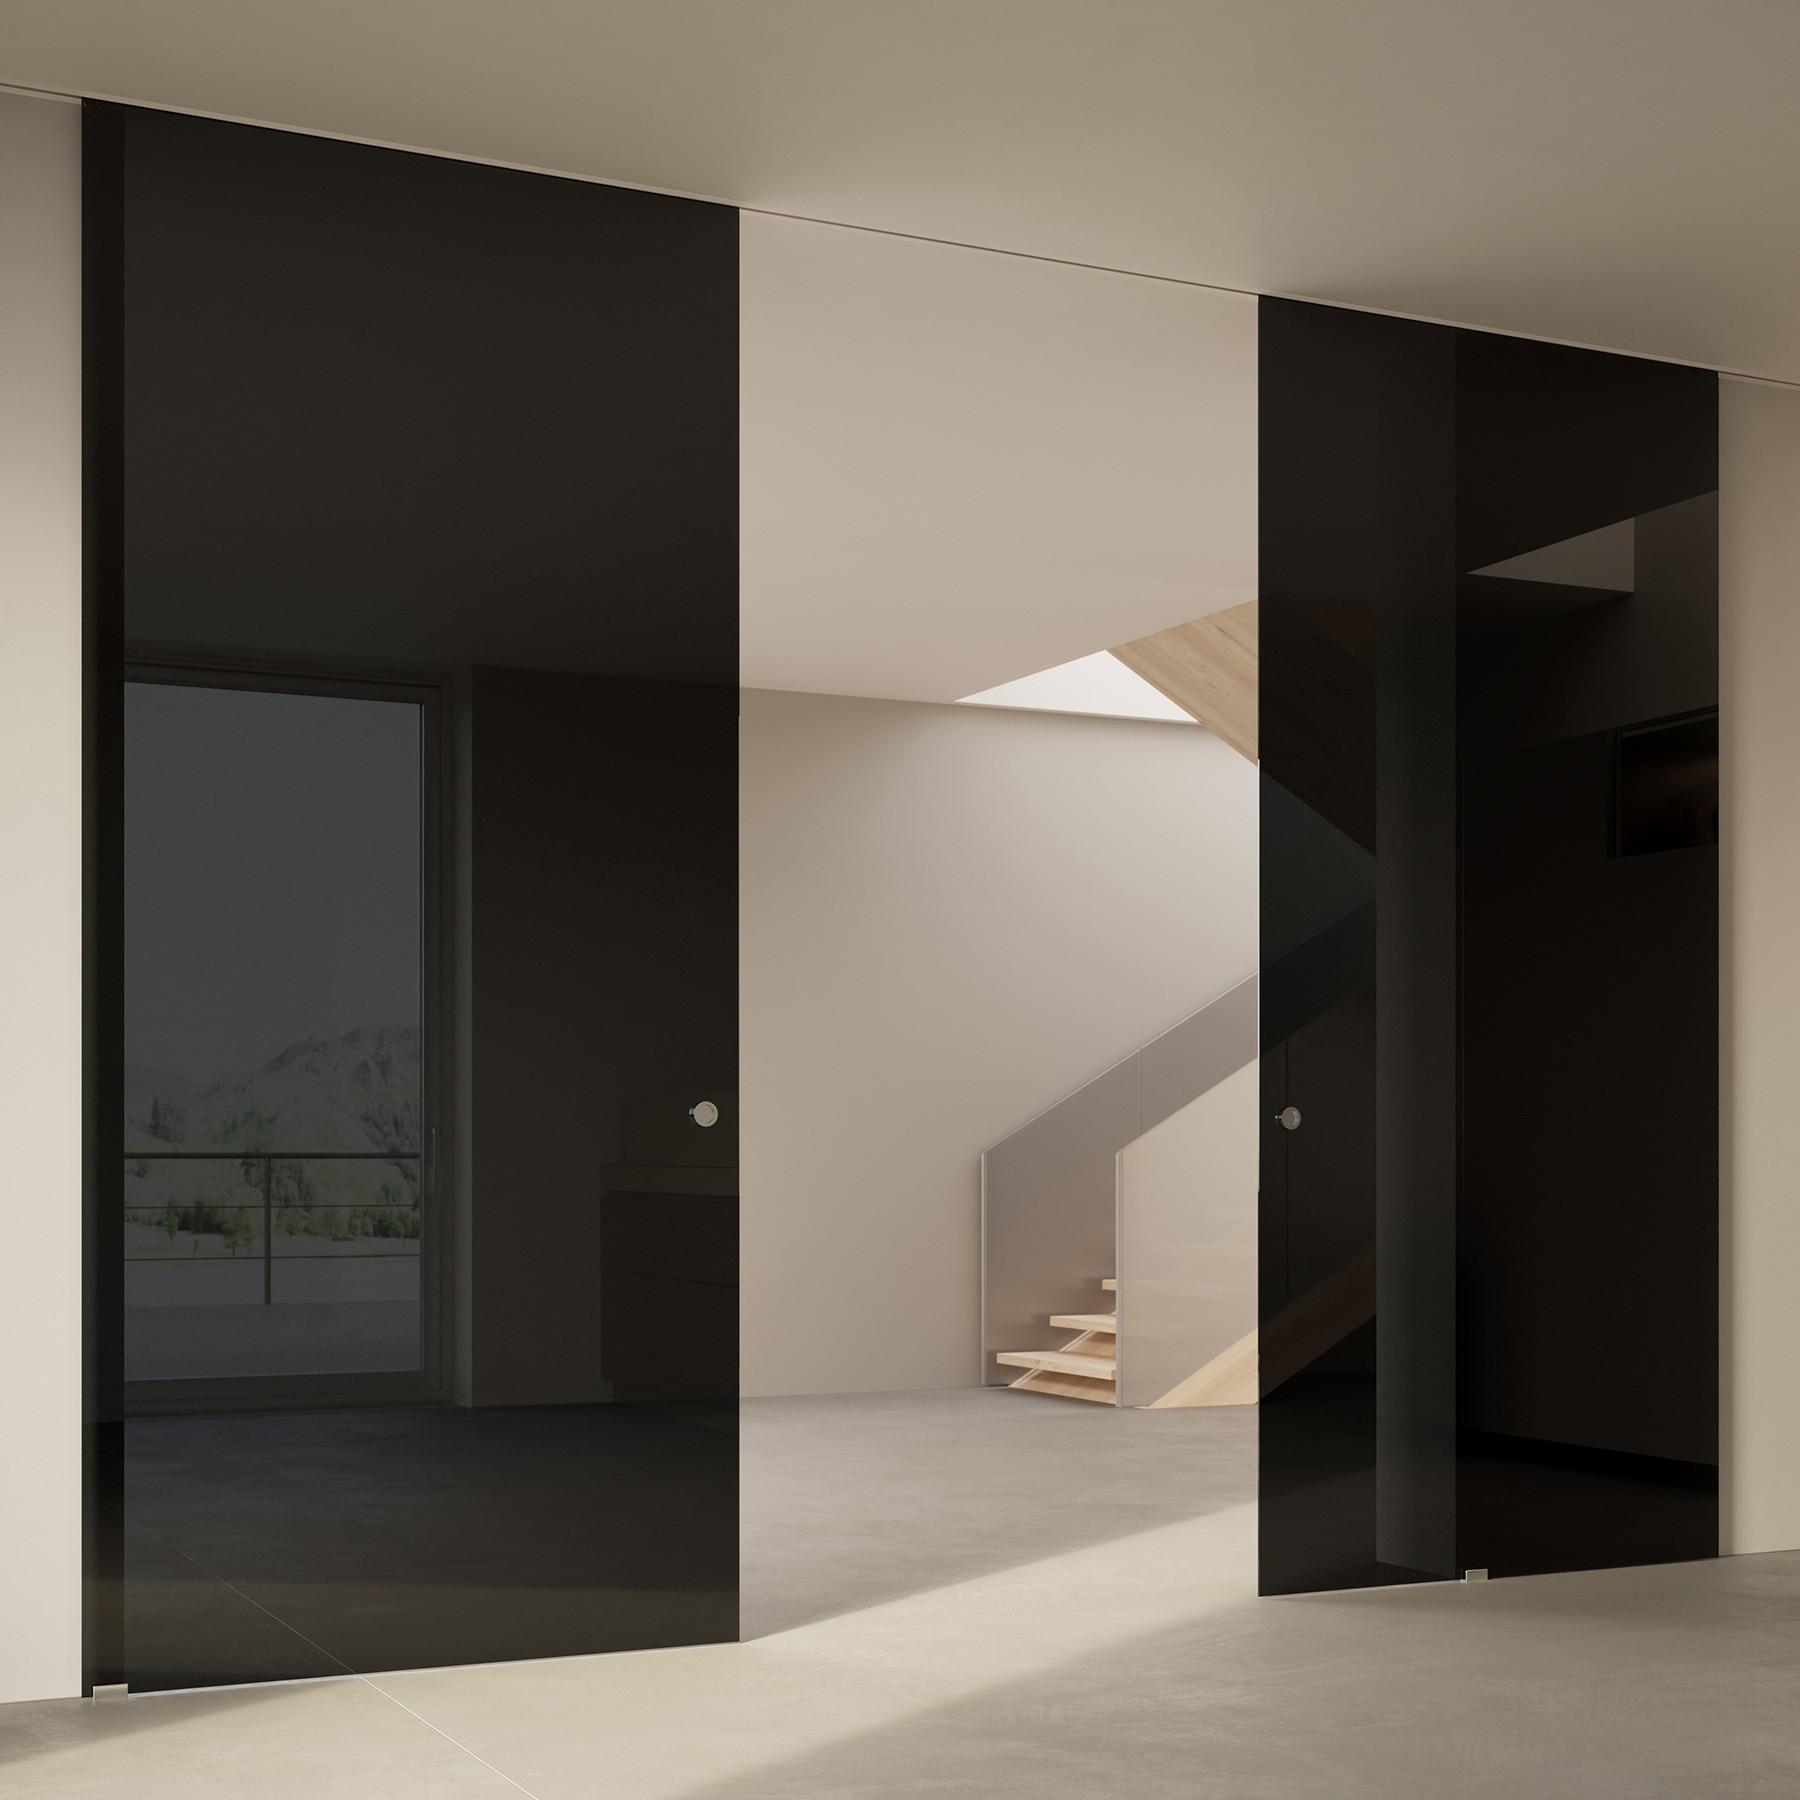 Scenario Visio Up with Glossy nero glass